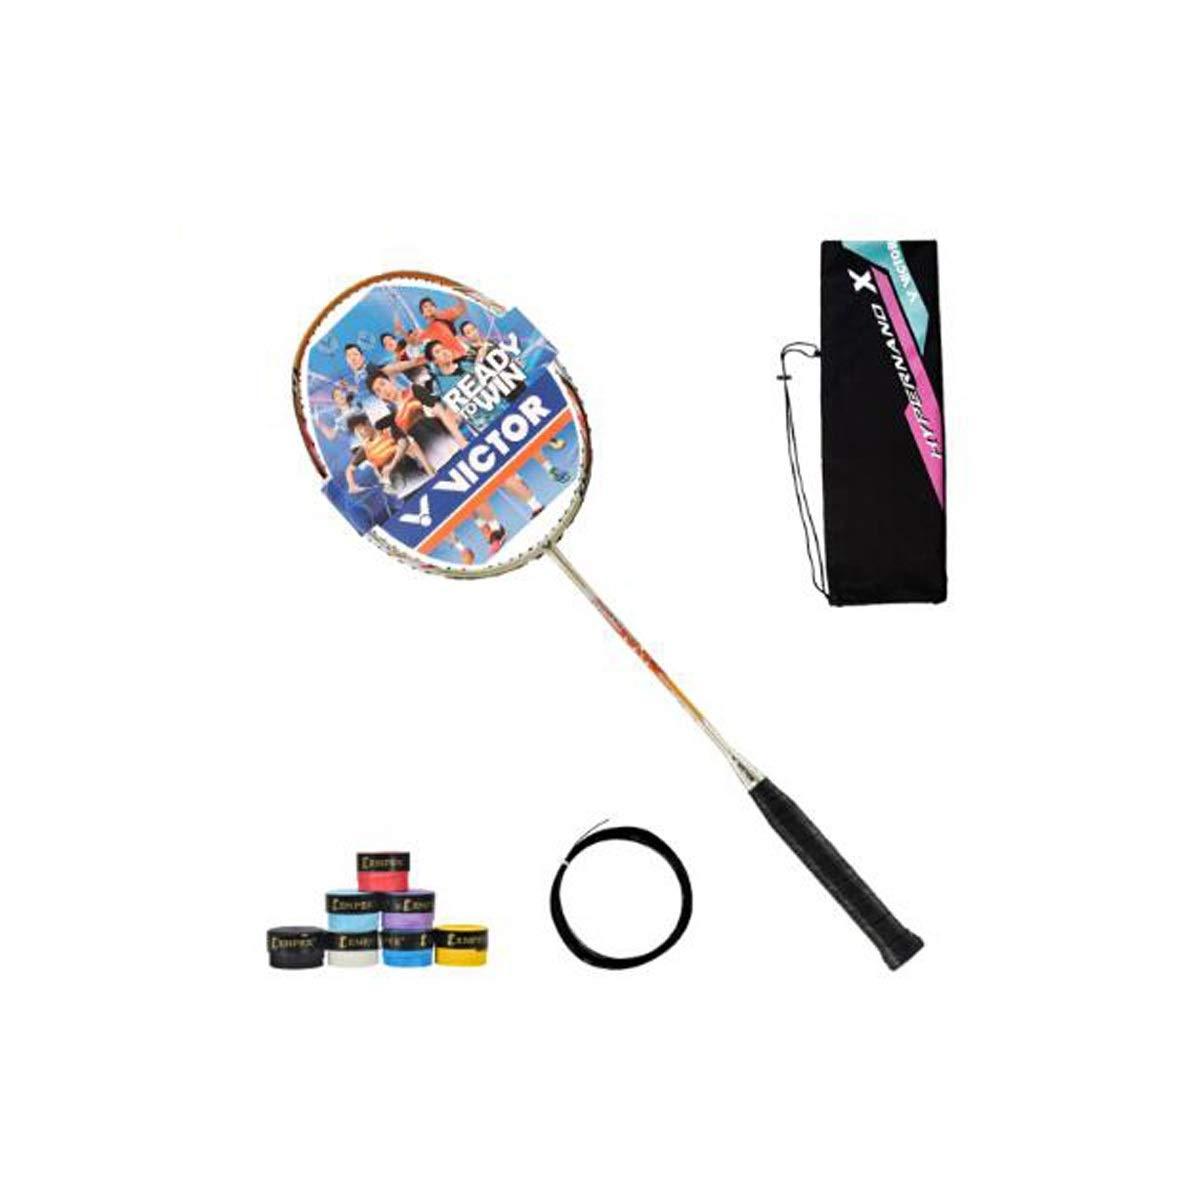 Tongboshi Nano 7sp Badminton Racket, Classic Full-Type High-Strength Carbon Fiber Badminton Racket, Single Hair, Champagne Gold, Feather Line is Not Worn Badminton Racket, (Color : Champagne Gold) by Tongboshi (Image #1)